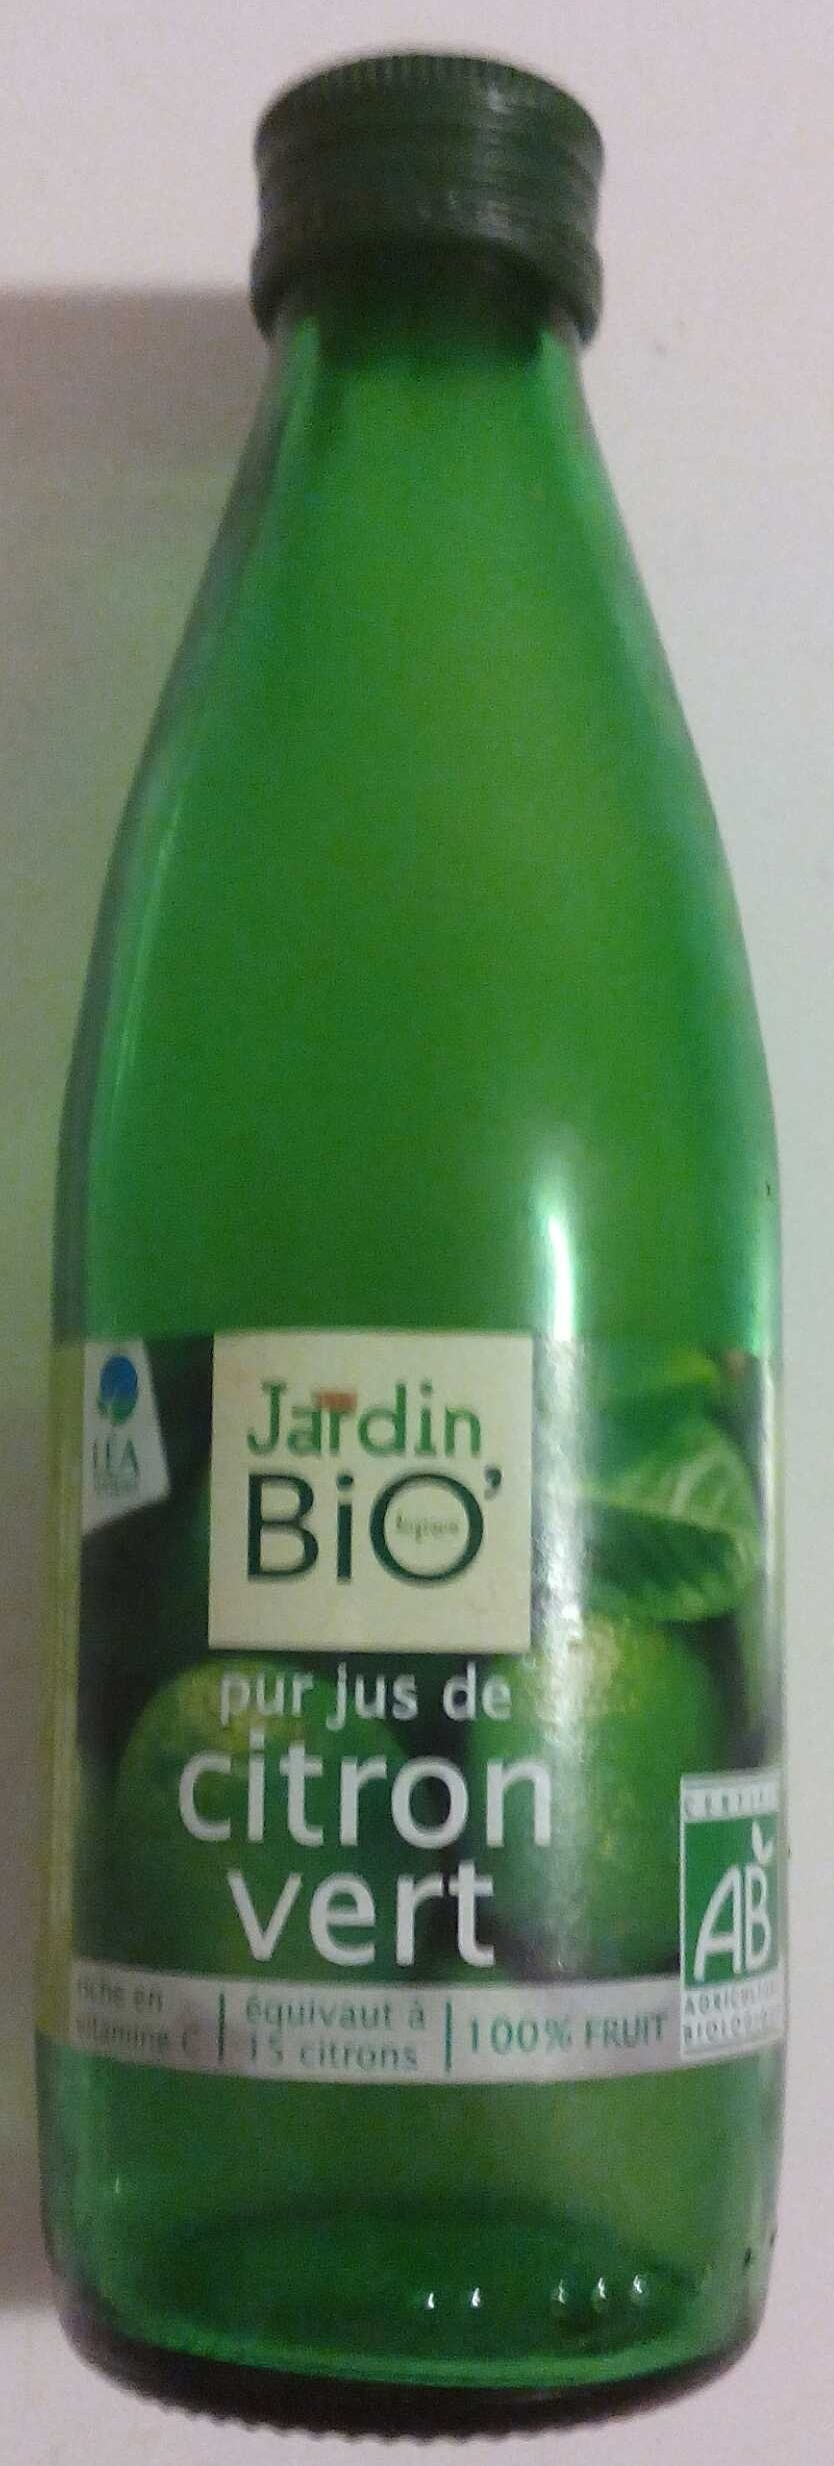 Pur jus citron vert - Product - fr